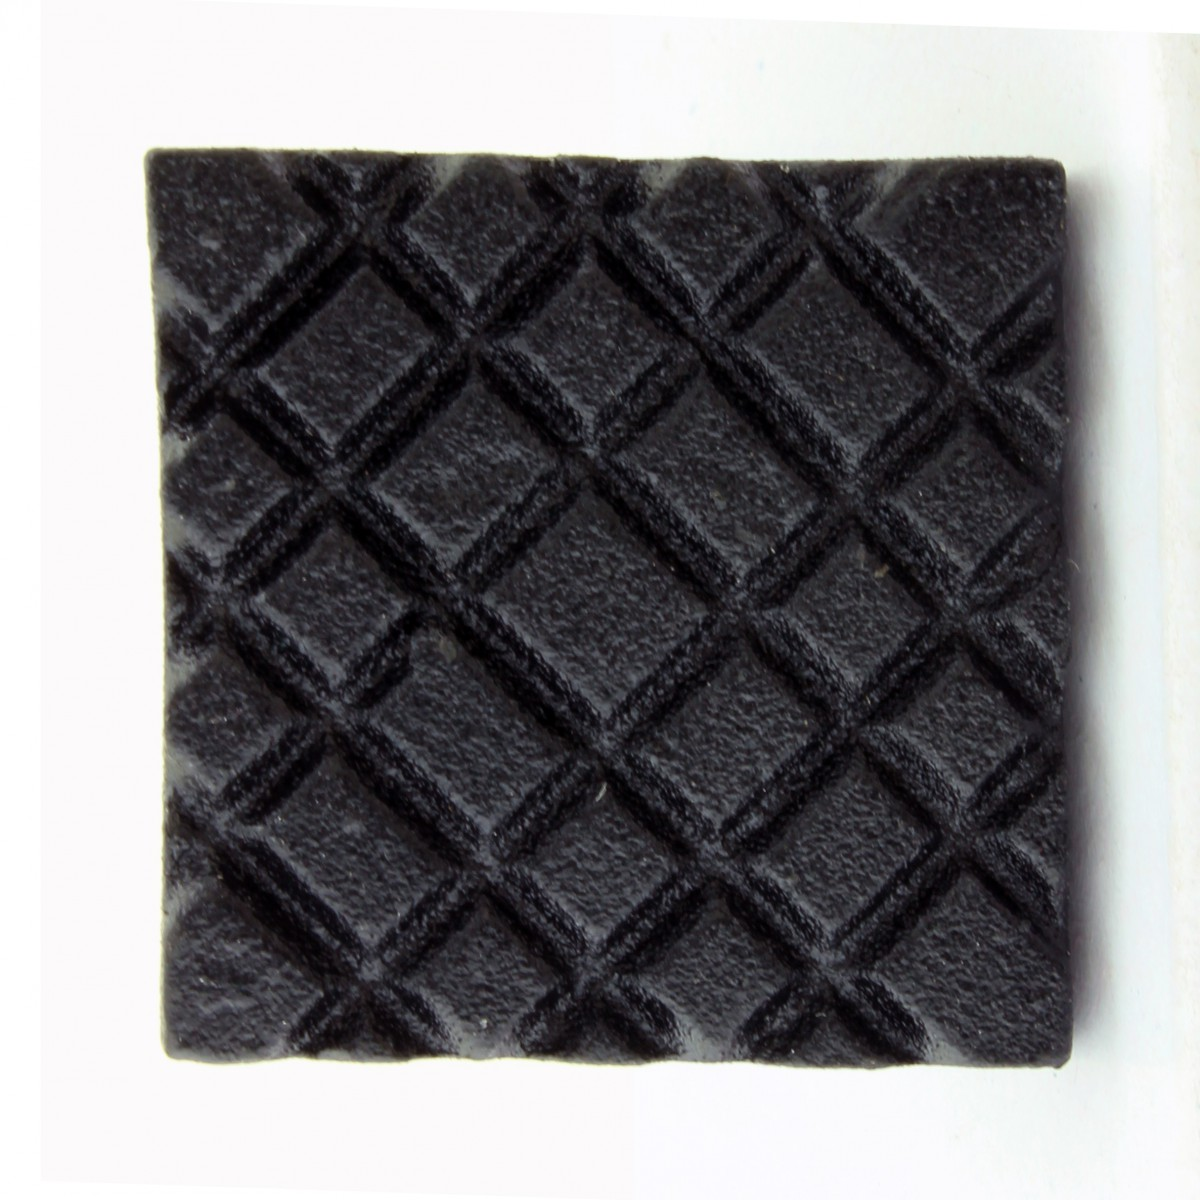 Square Diamond Grid Iron Cabinet Knob Black Pack of 10 Cabinet Knob Iron Cabinet Knob Cabinet Knob Black